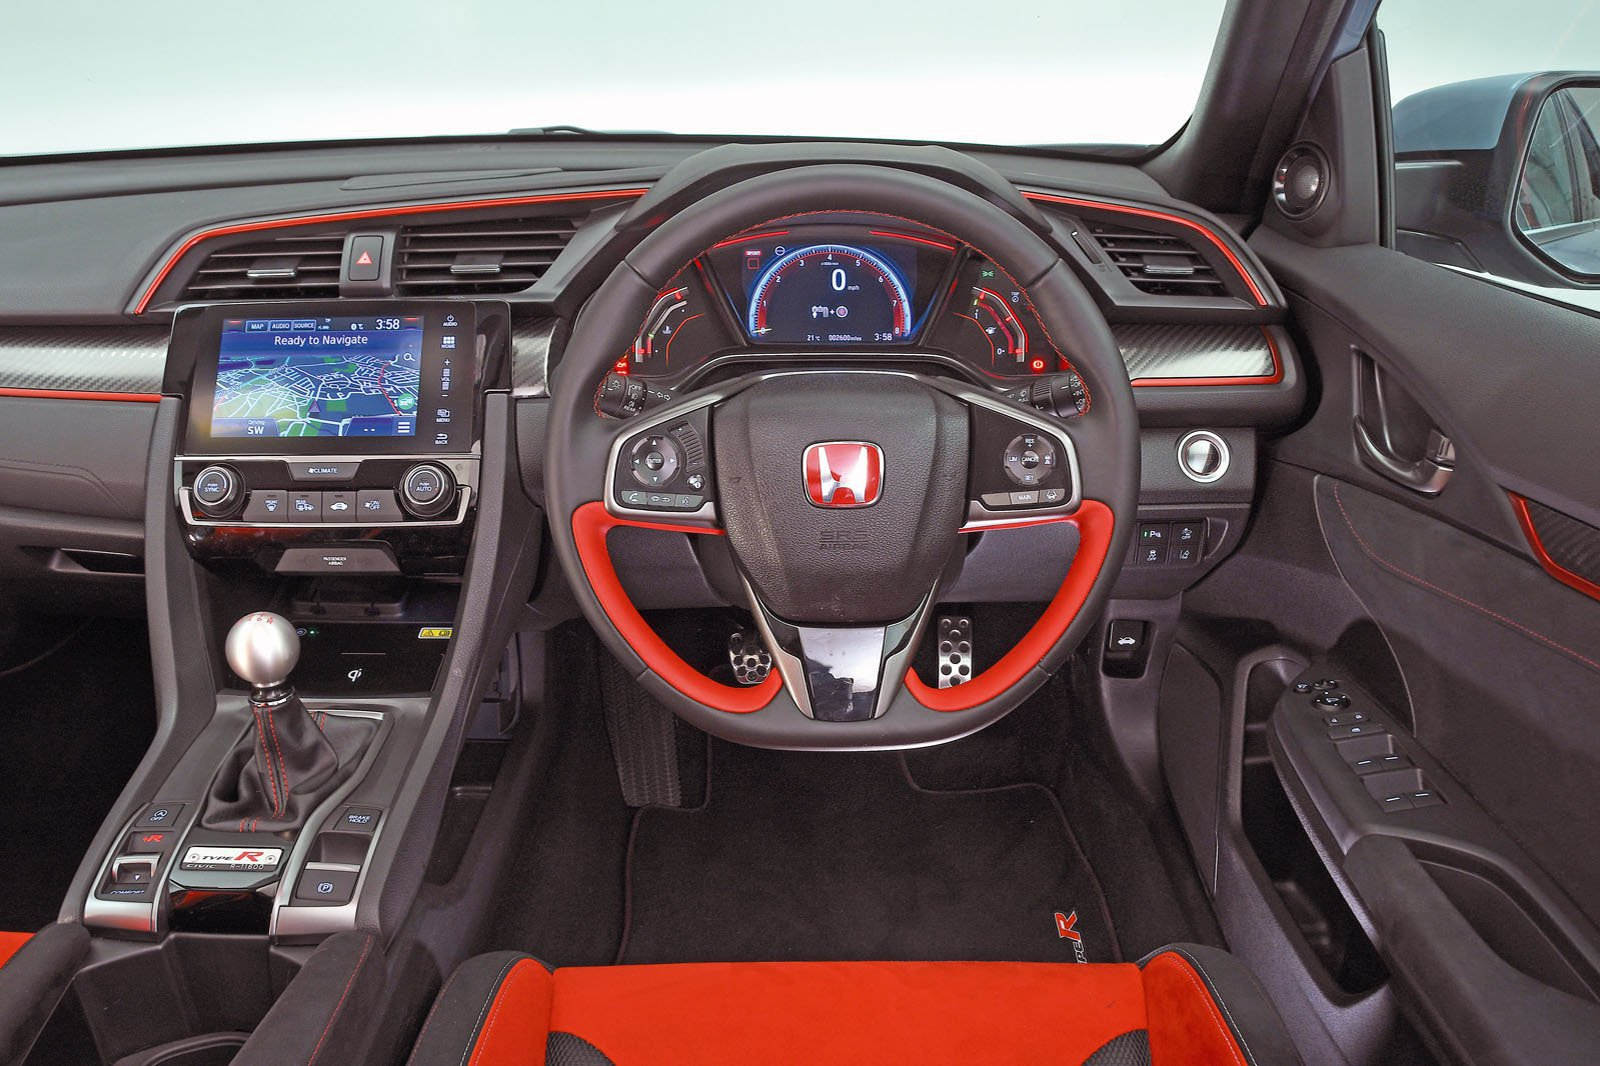 Honda Civic Type R 2.0 VTEC Turbo GT - interior